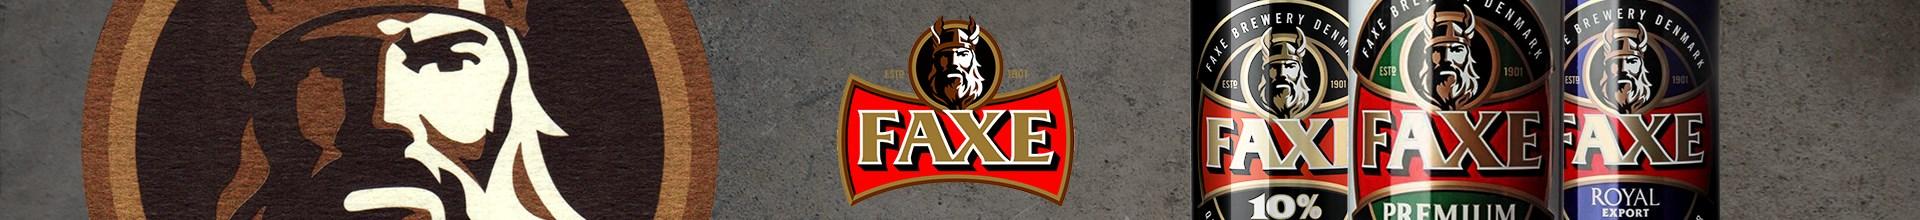 Cervejaria Faxe